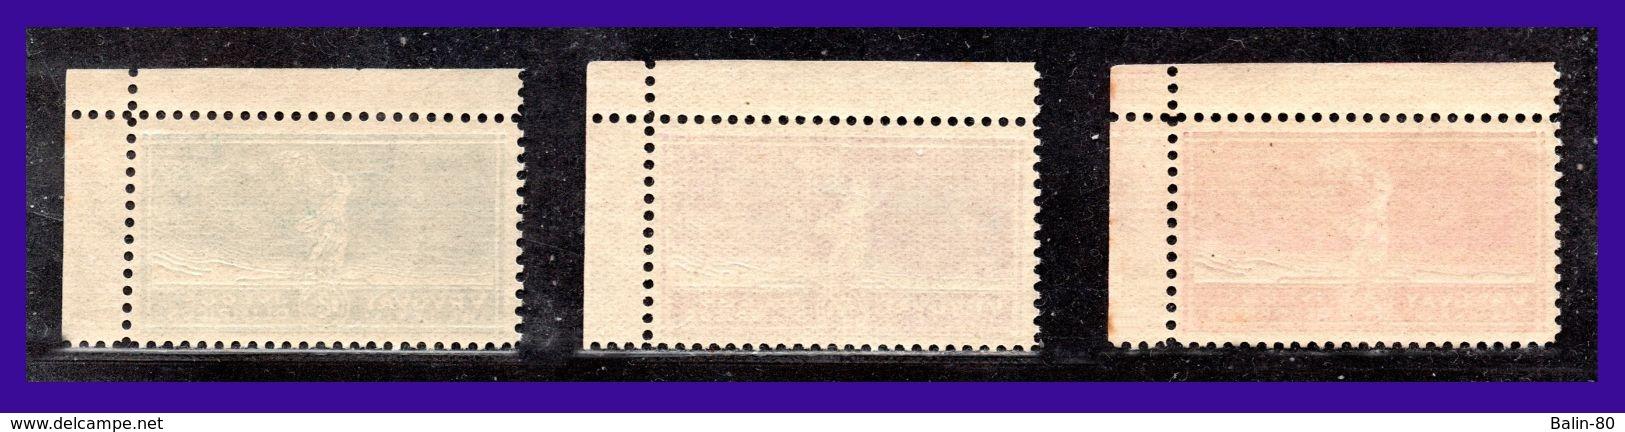 1924 - Uruguay - Scott Nº 282 / 284 - MNH - Gran Lujo - Esquina De Pliego - Borde De Hoja - UR- 40 - Uruguay